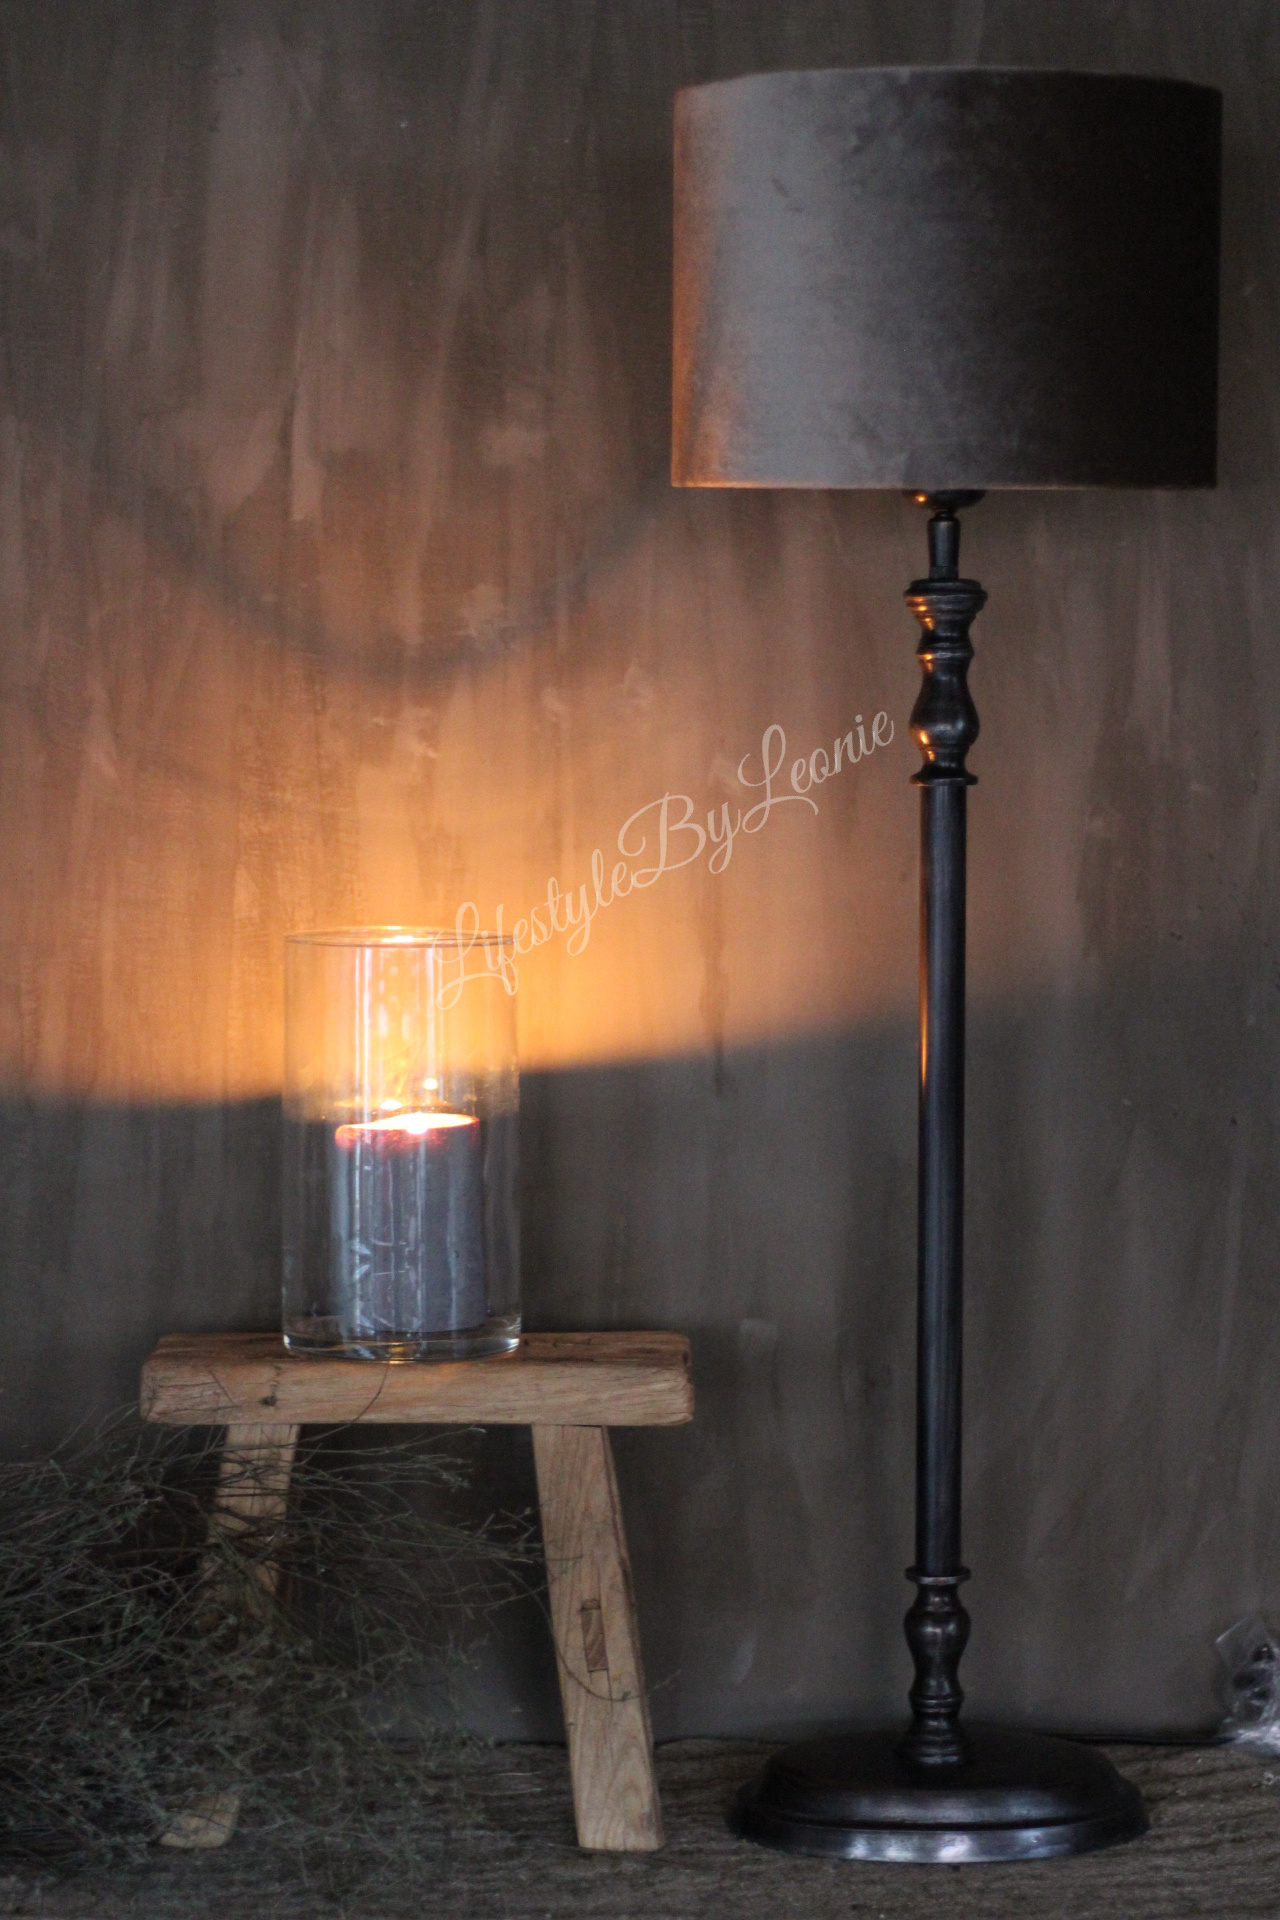 Fonkelnieuw Lamp & Licht - Lifestyle By Leonie AI-43